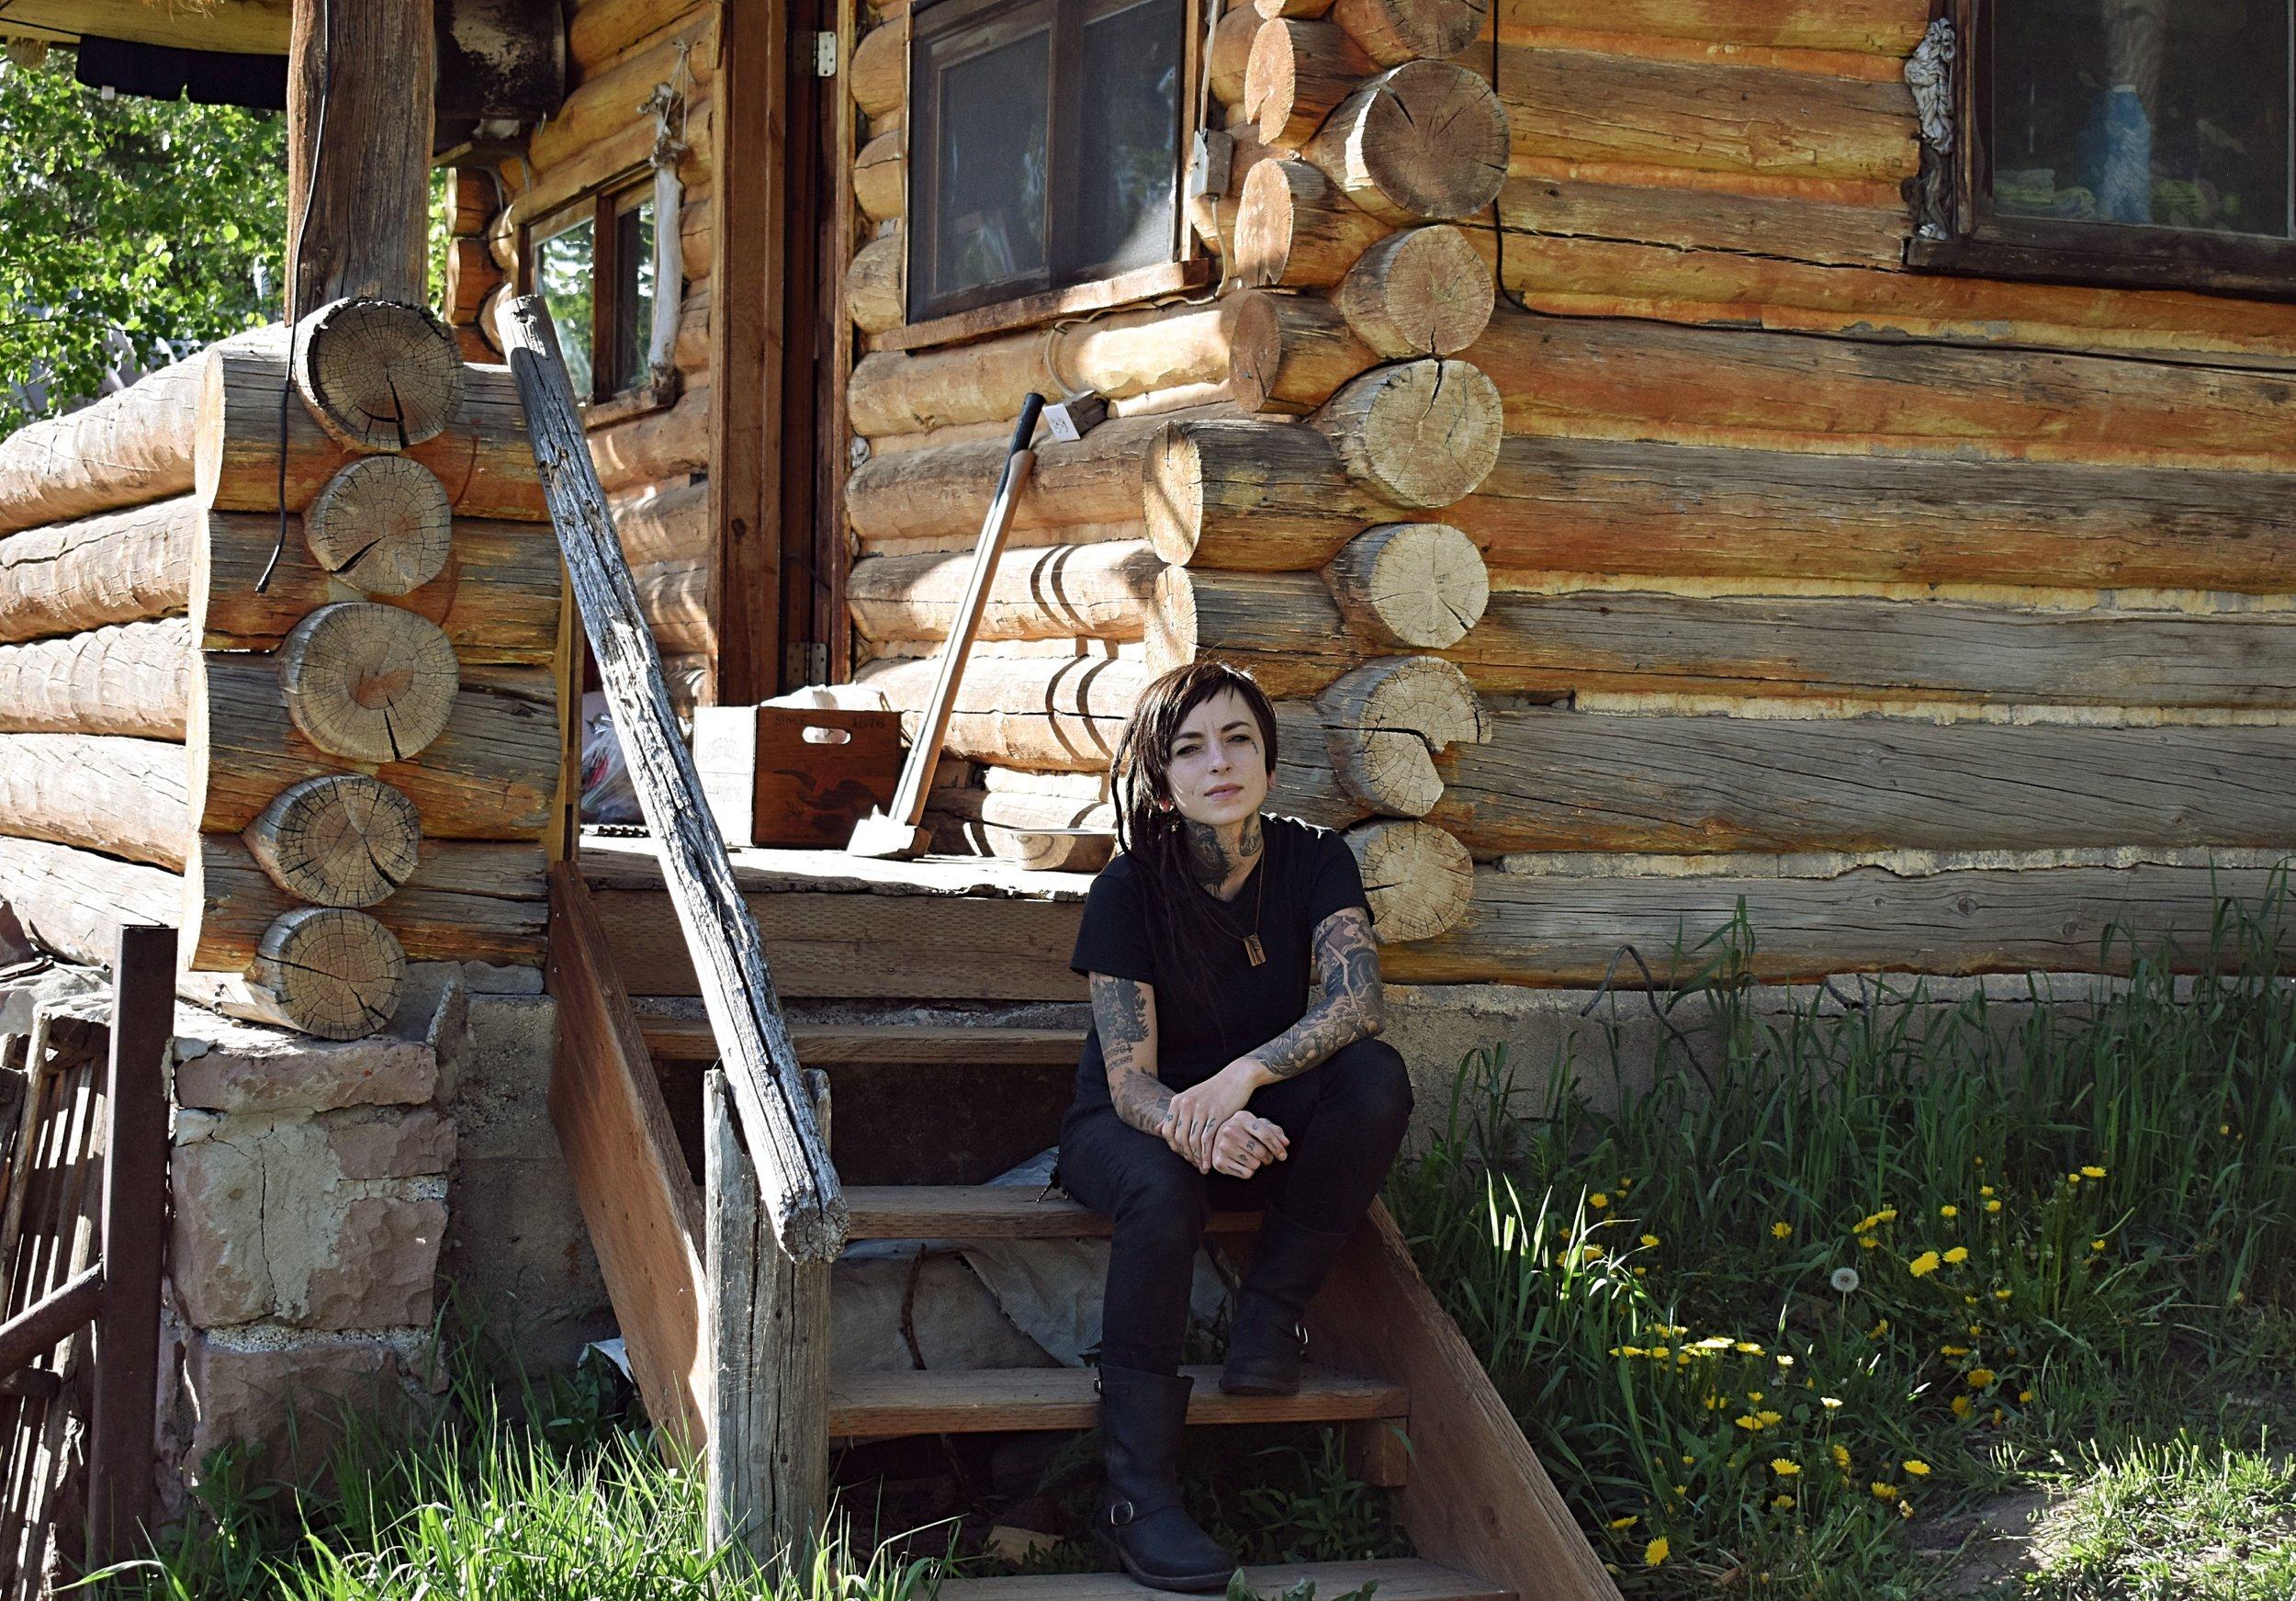 XIII. RACHEL SHELTON - Wildcrafter, bone carver, and photographer. May—June 2017.